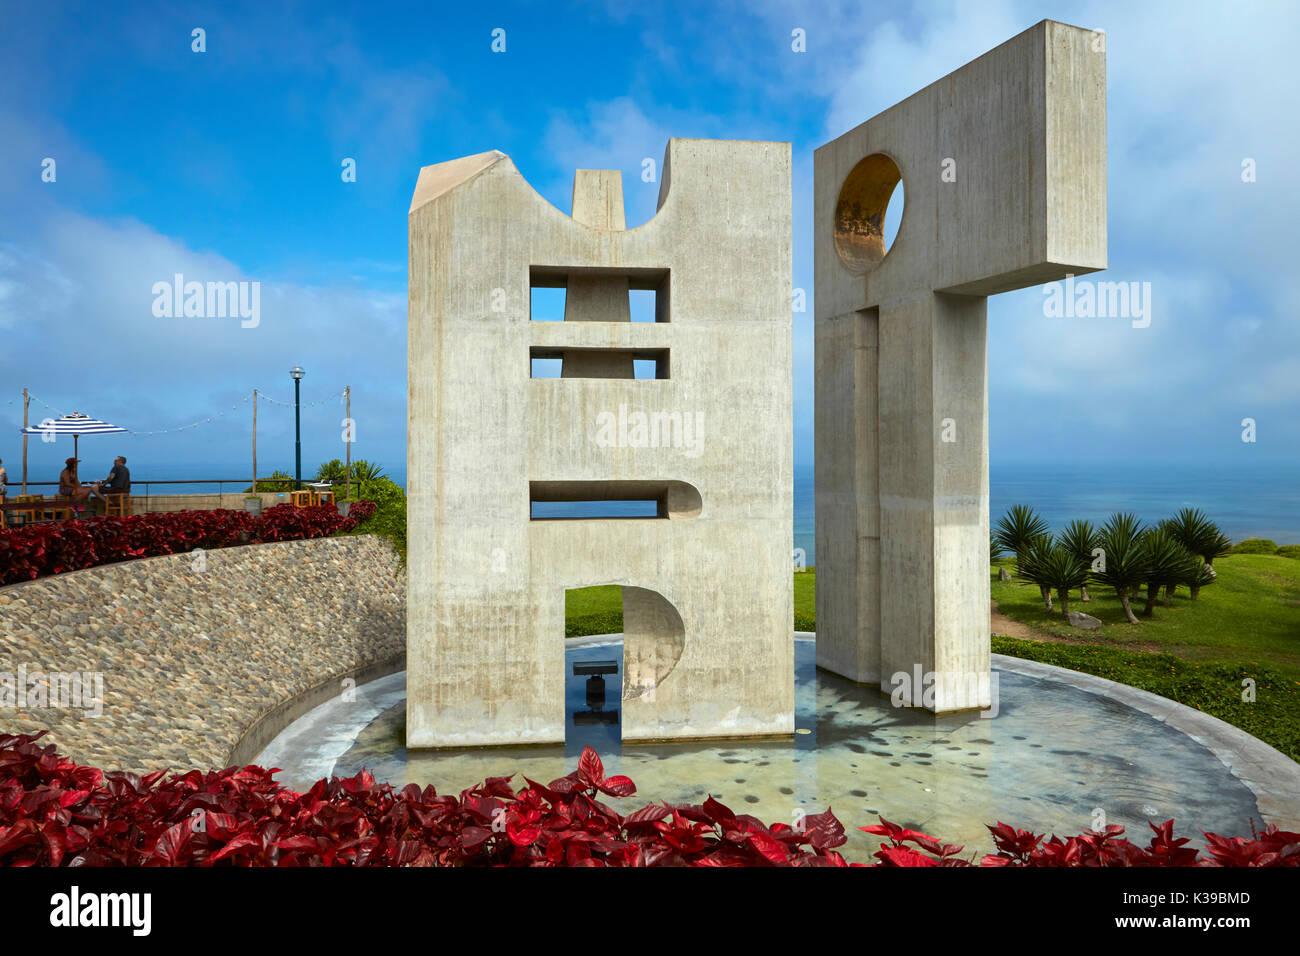 Intihuatana sculpture by Fernando de Szyszlo, Intihuatuna Park, Miraflores, Lima, Peru, South America - Stock Image